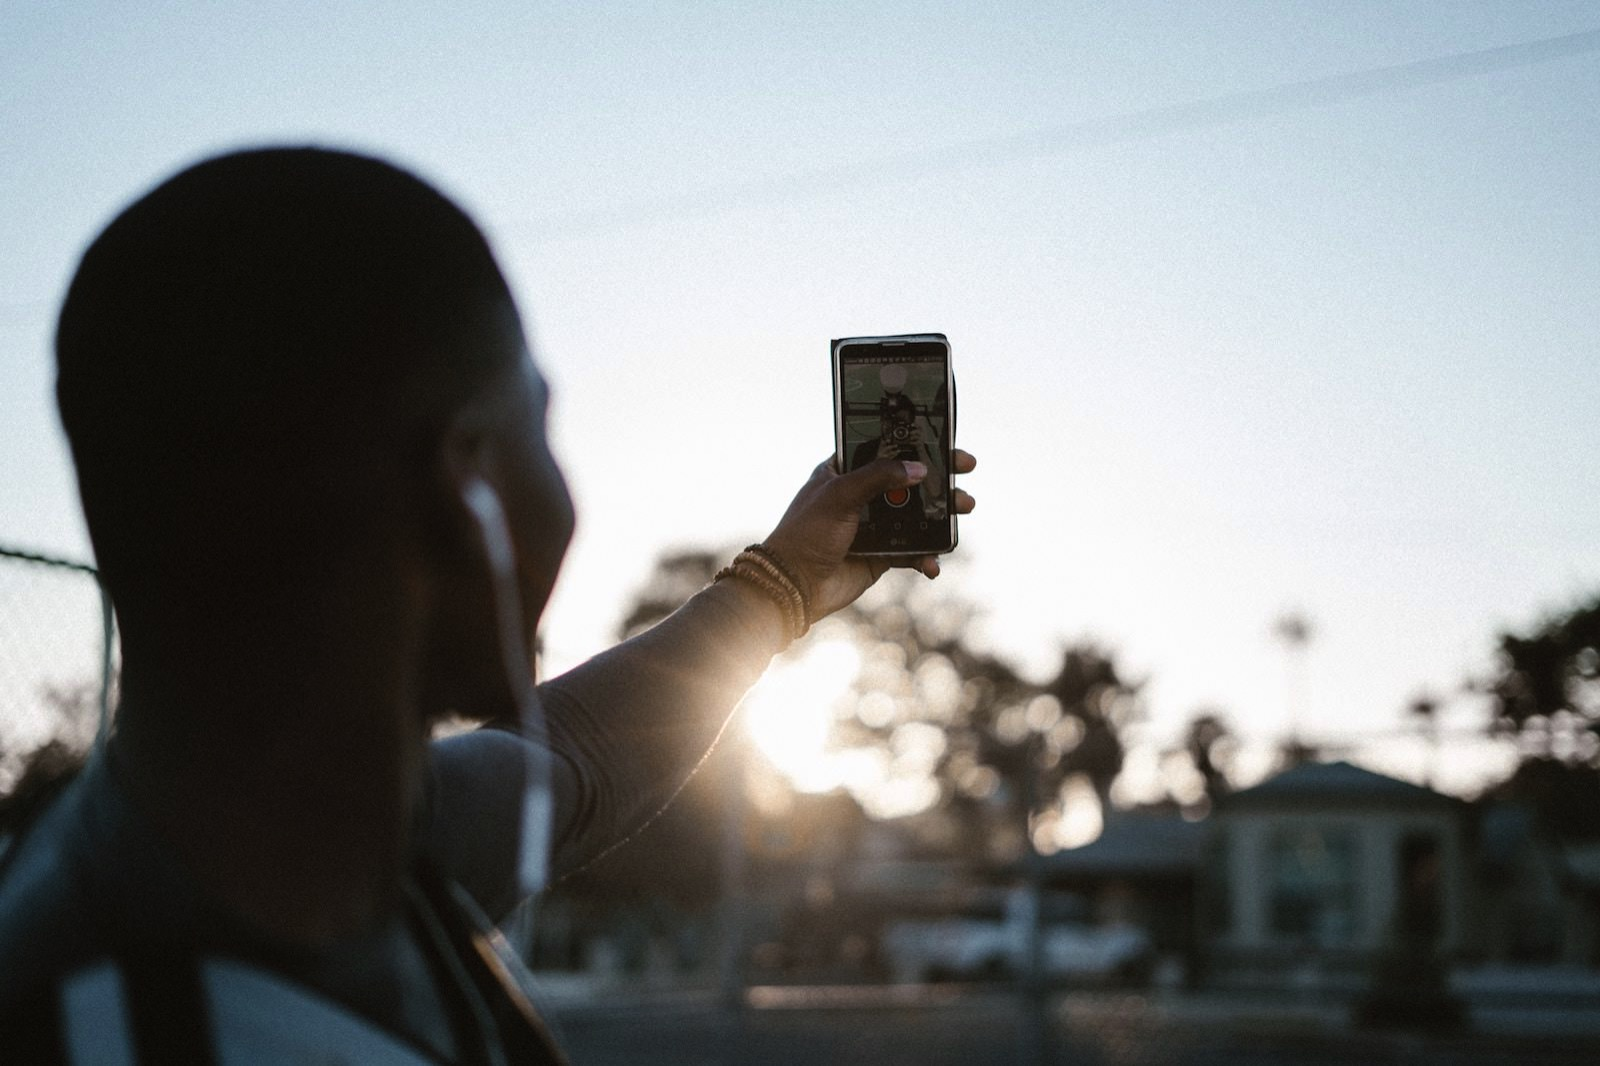 levi-elizaga-454770-unsplash-taking-a-selfie.jpg